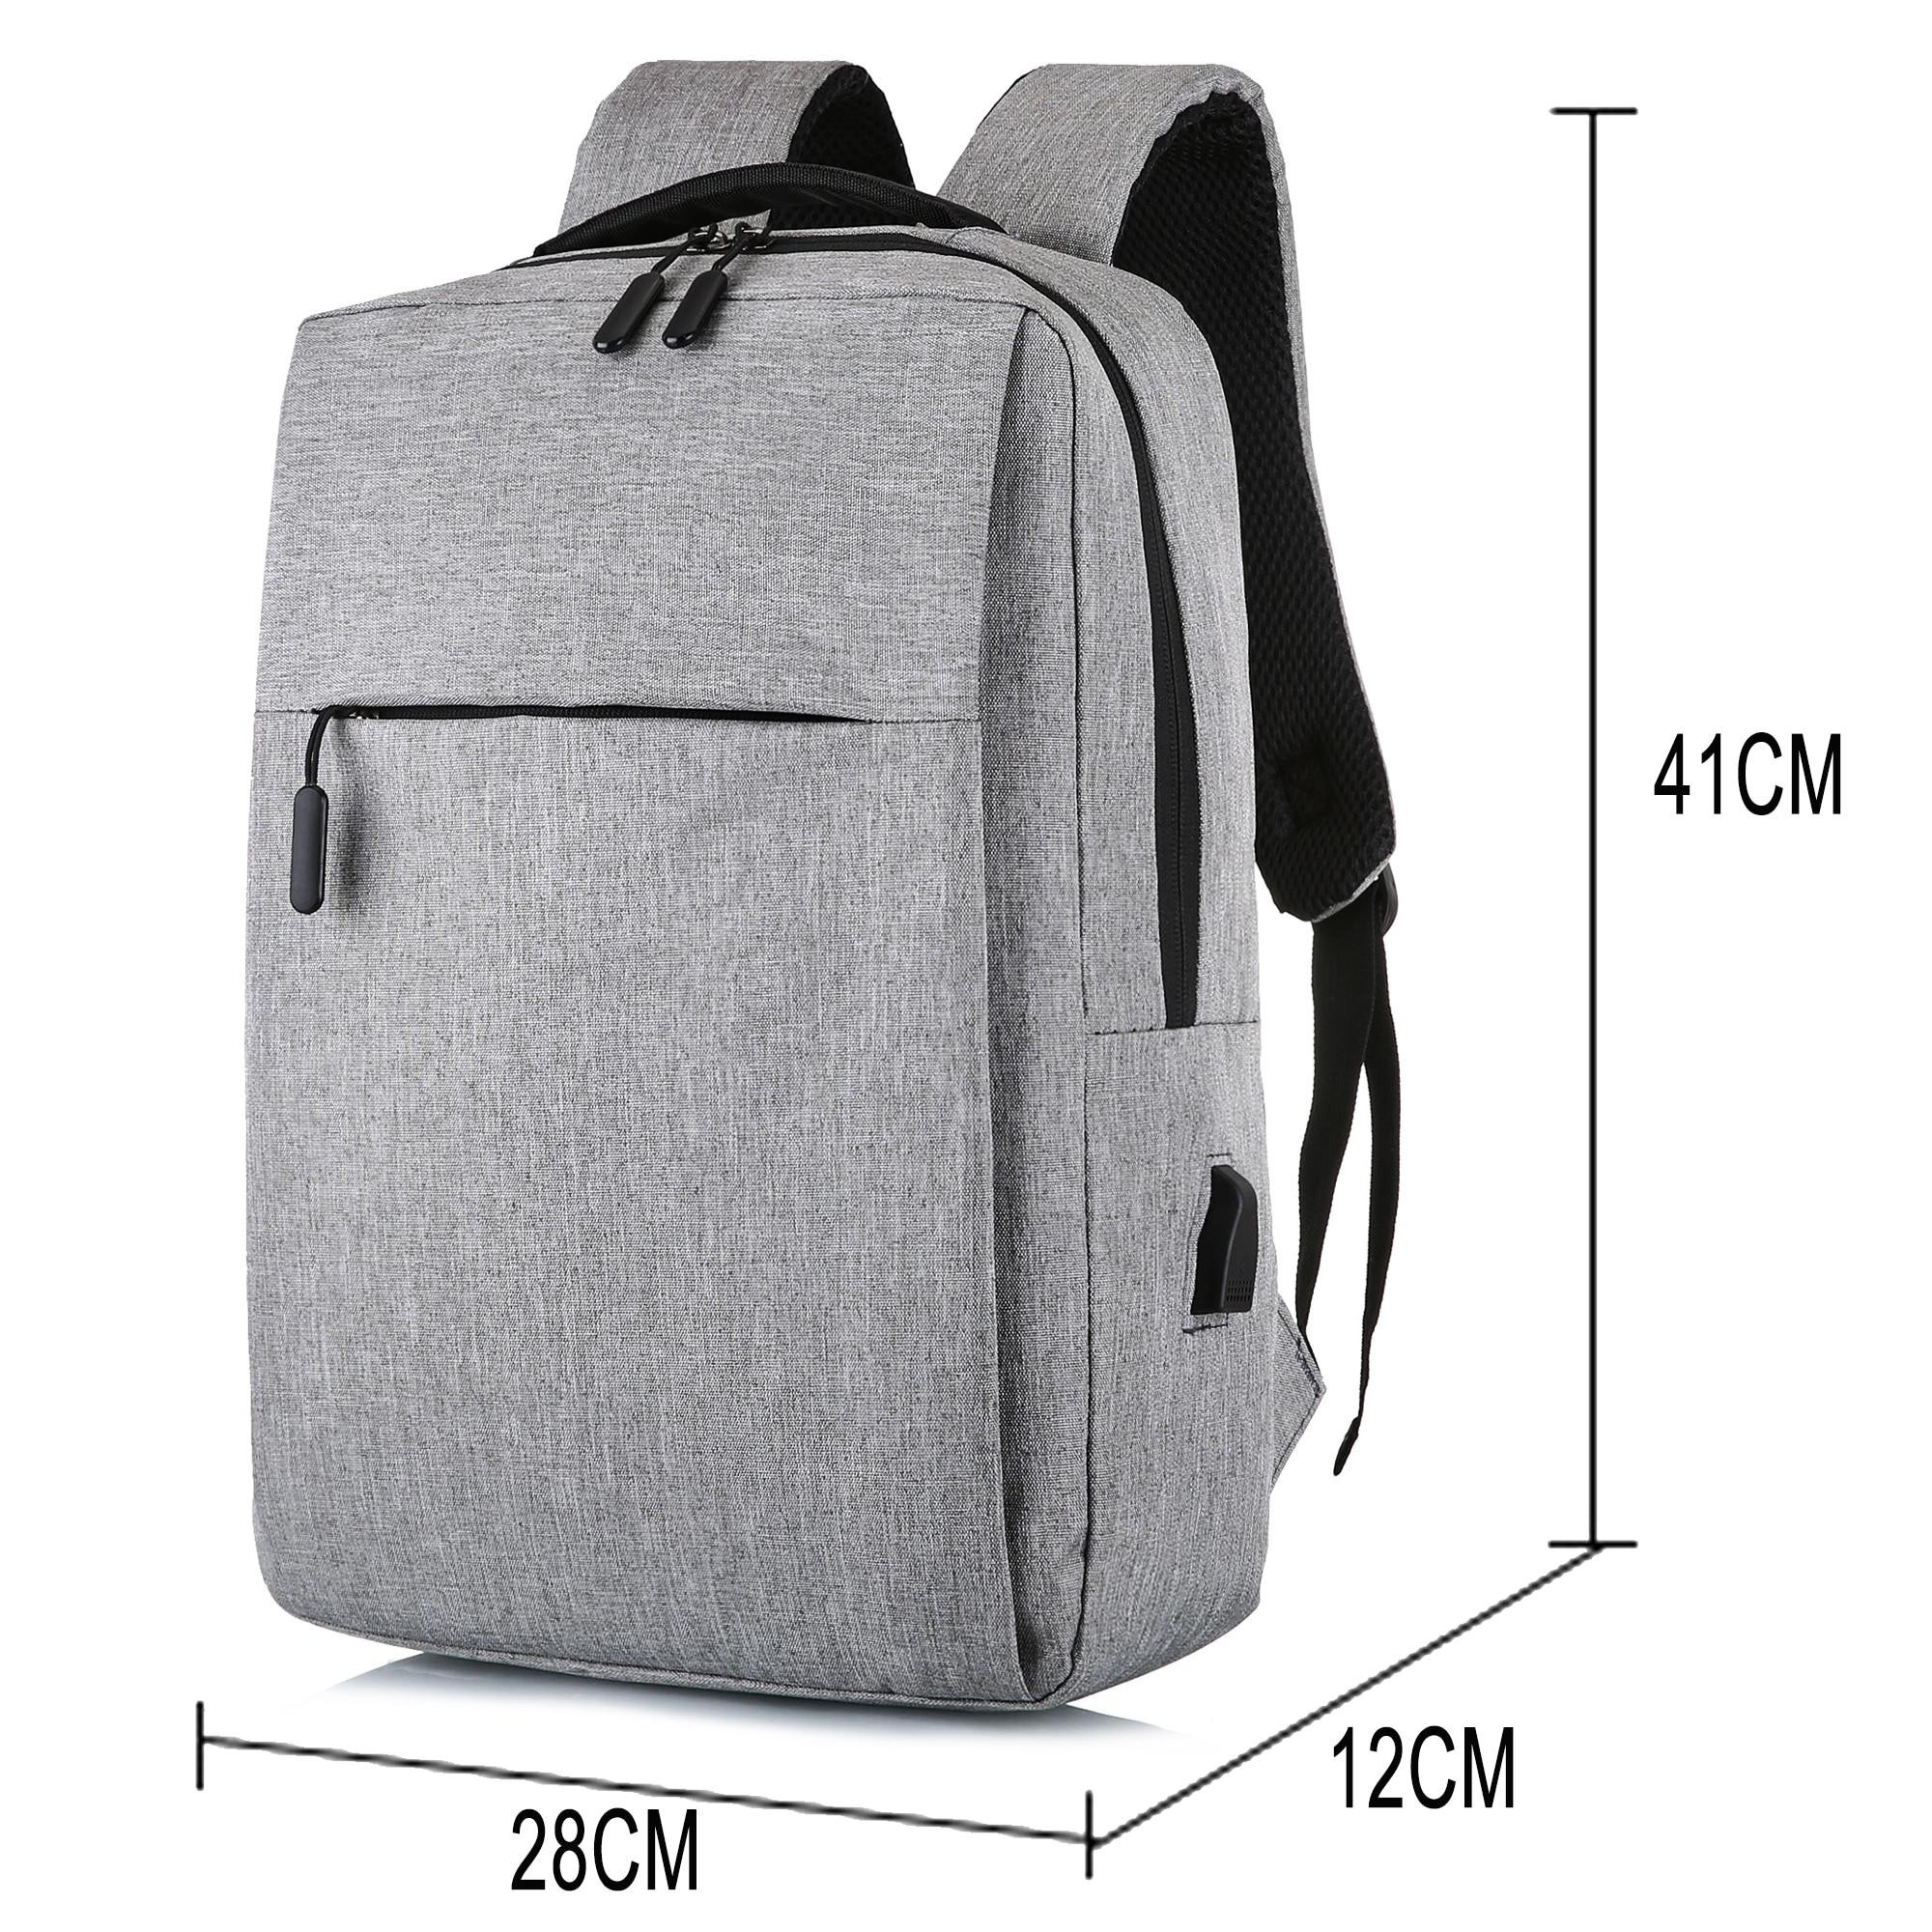 Rucsac pentru laptop cu USB, rucsac antifurt cu rucsac școlar, - Rucsacuri - Fotografie 5